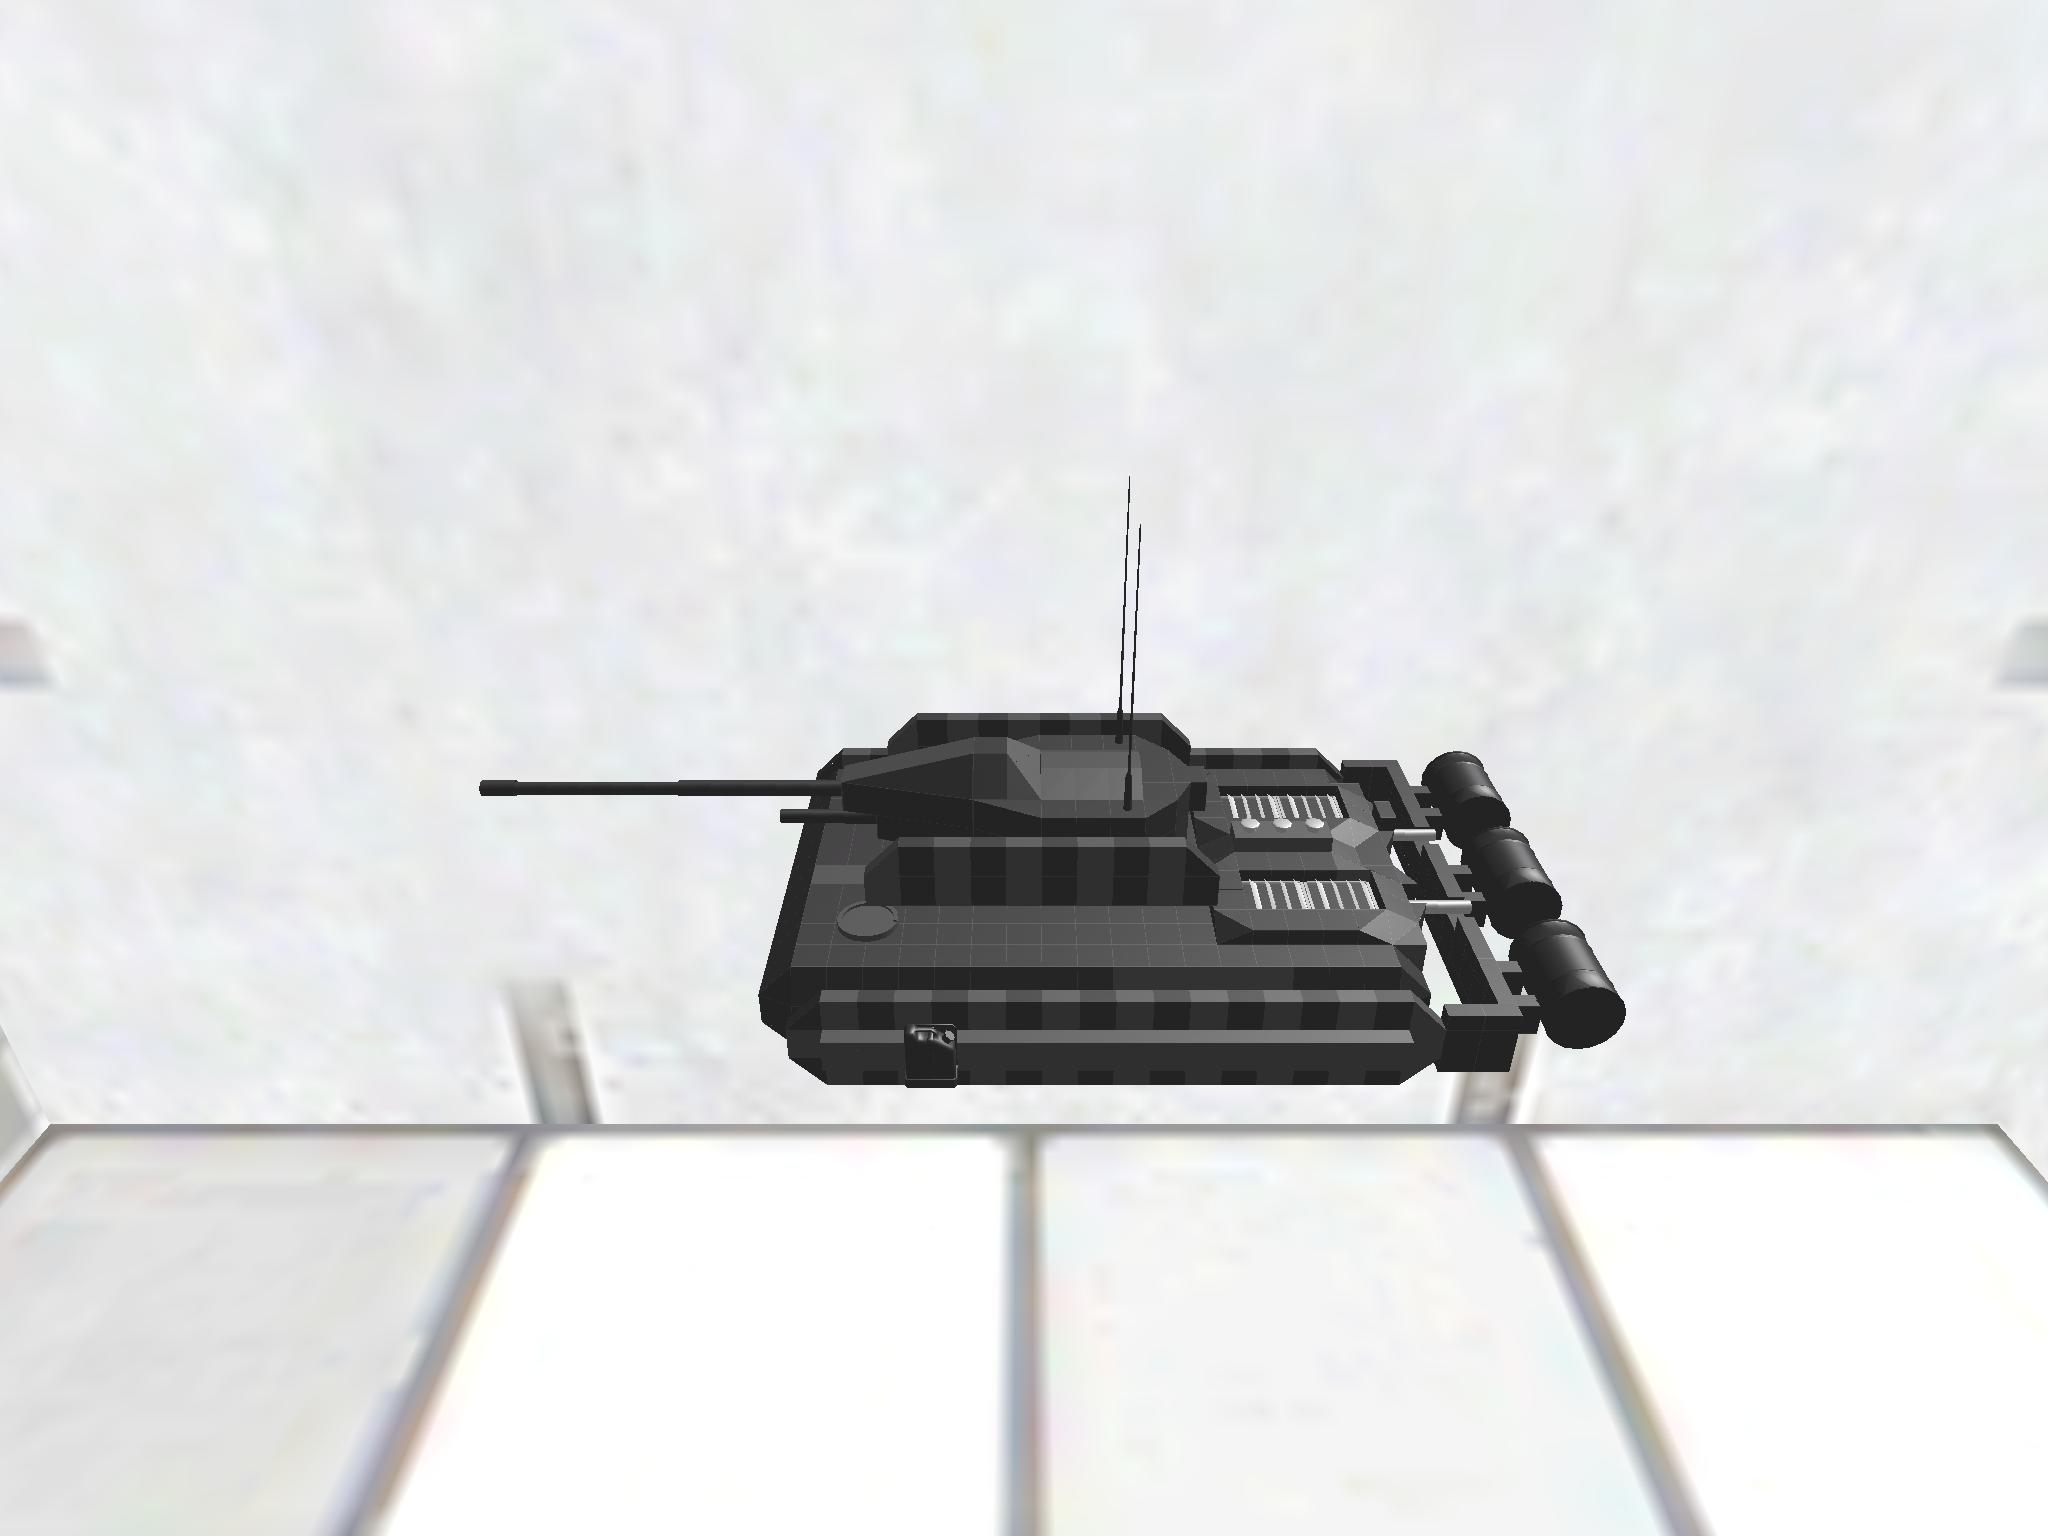 Gepard 120 MK 4X